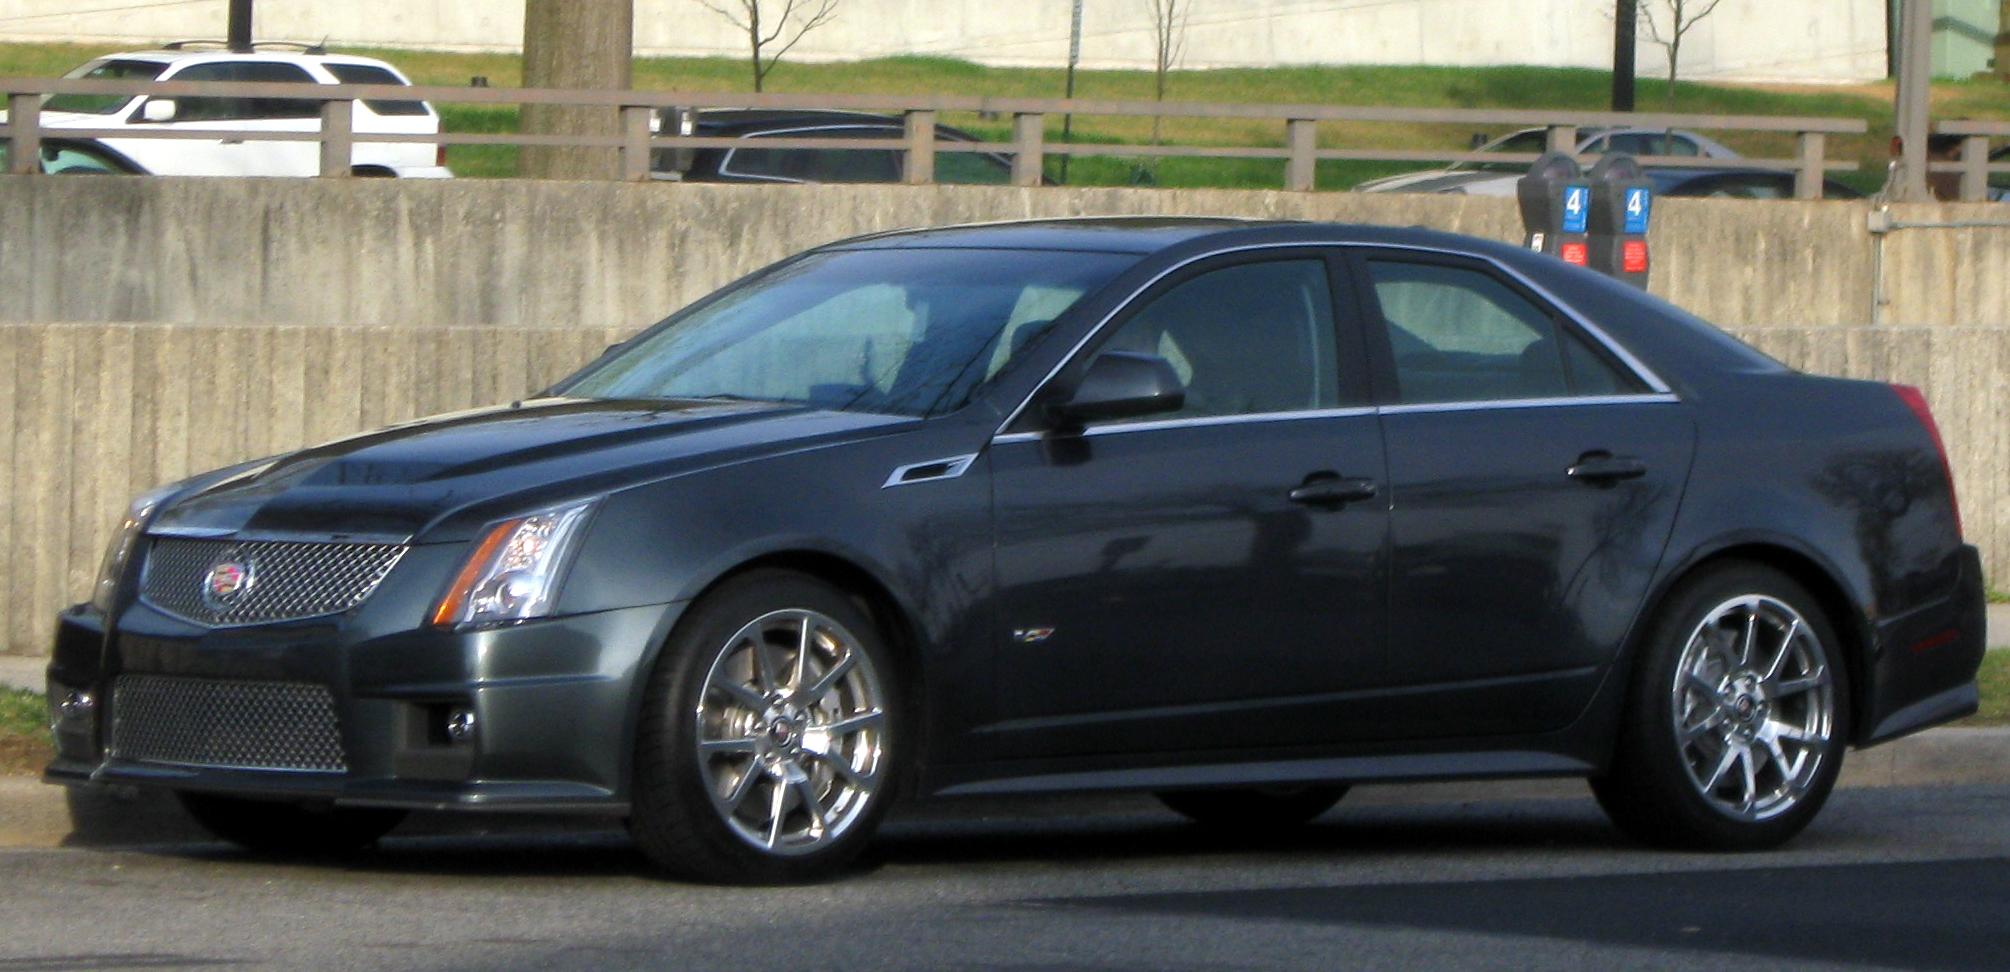 2010 Cadillac CTS-V #21 Cadillac CTS-V #21